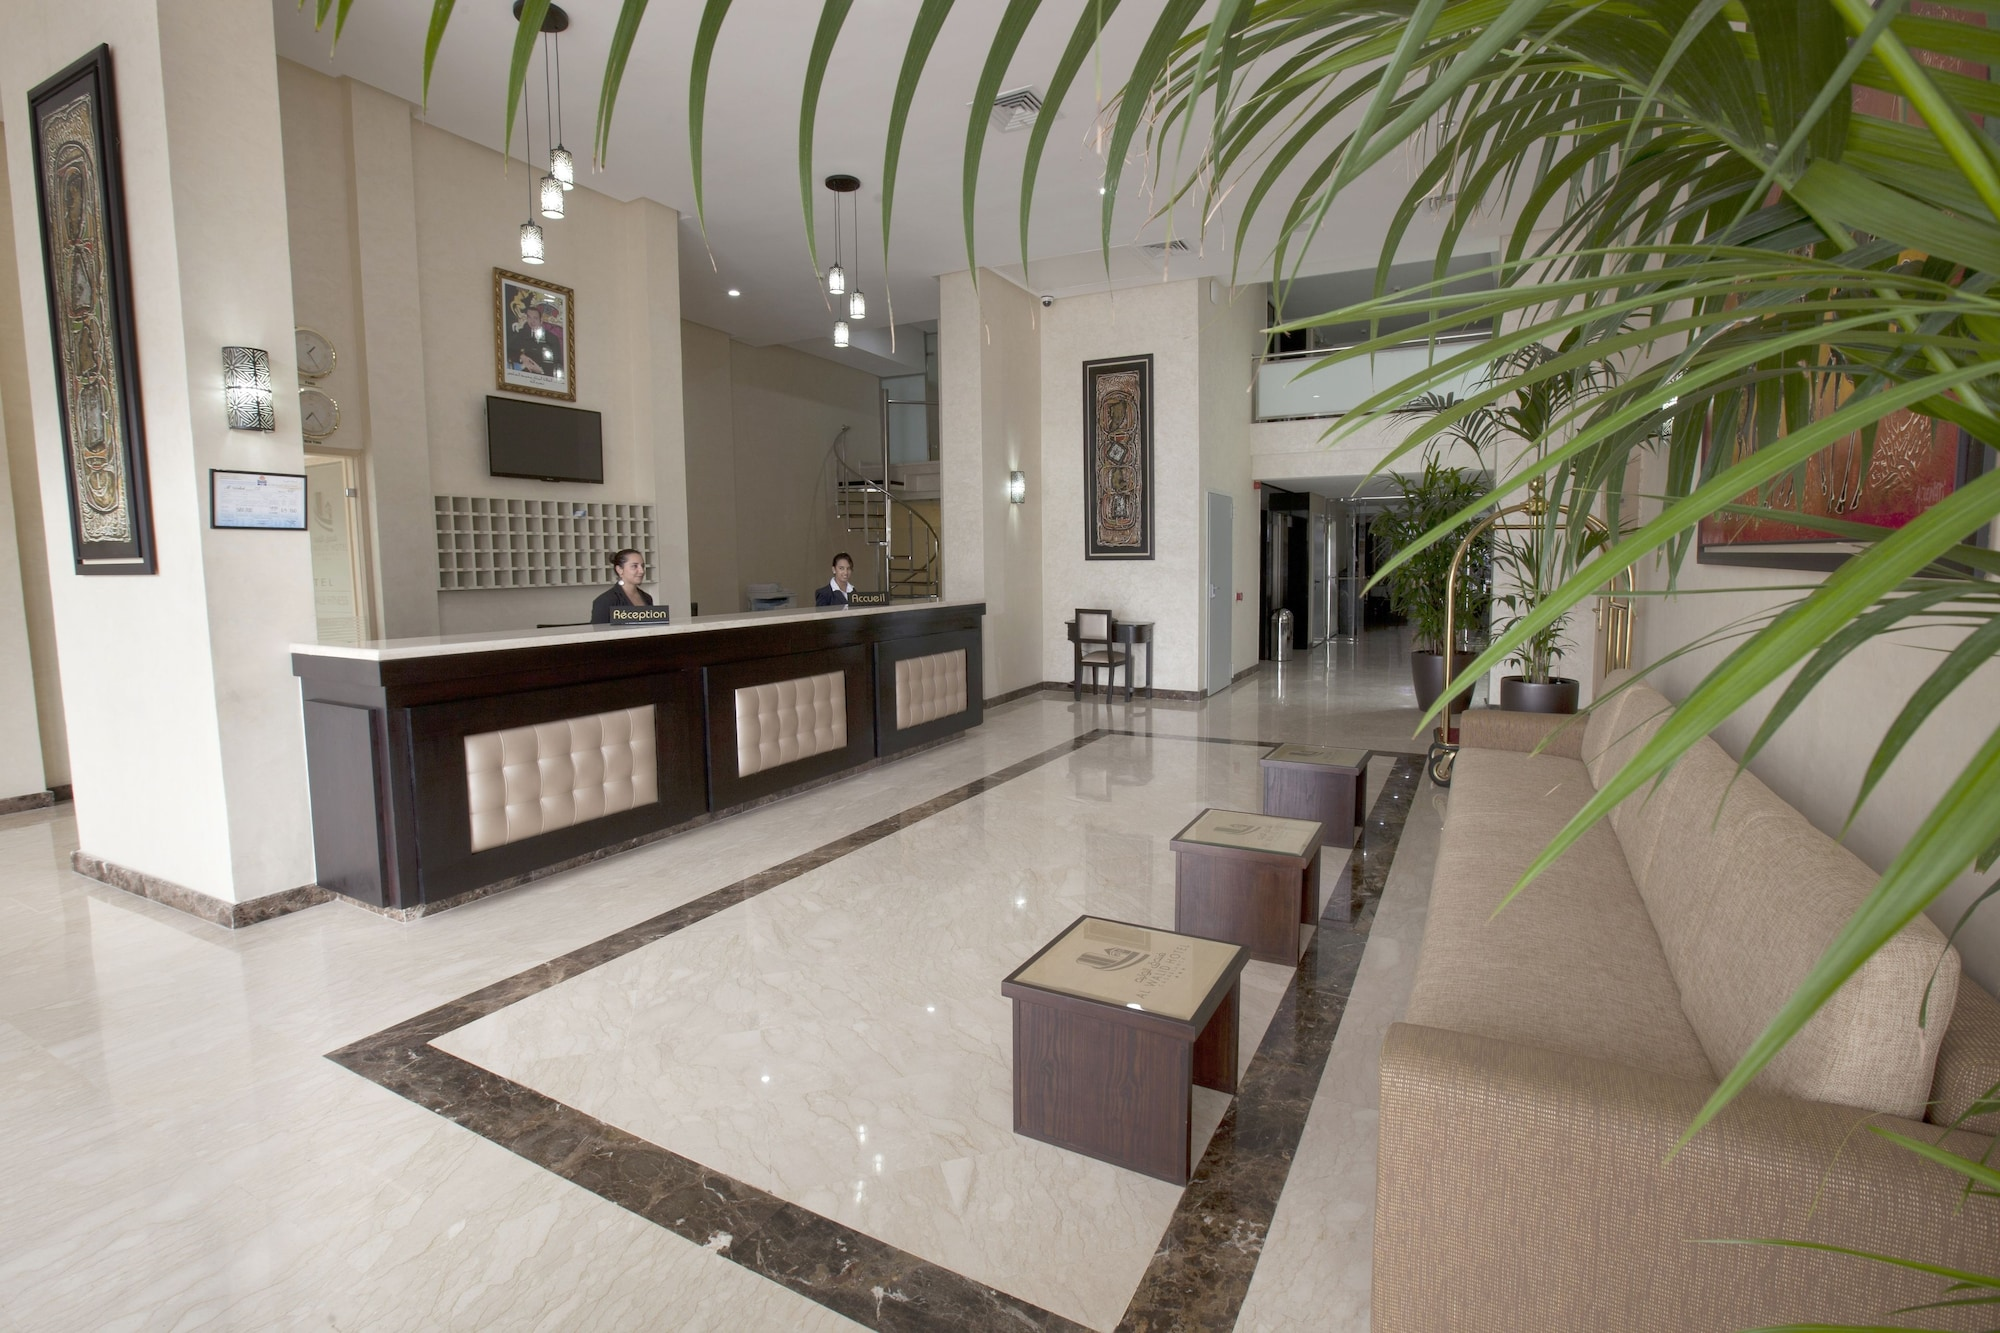 Alwalid Hotel, Casablanca